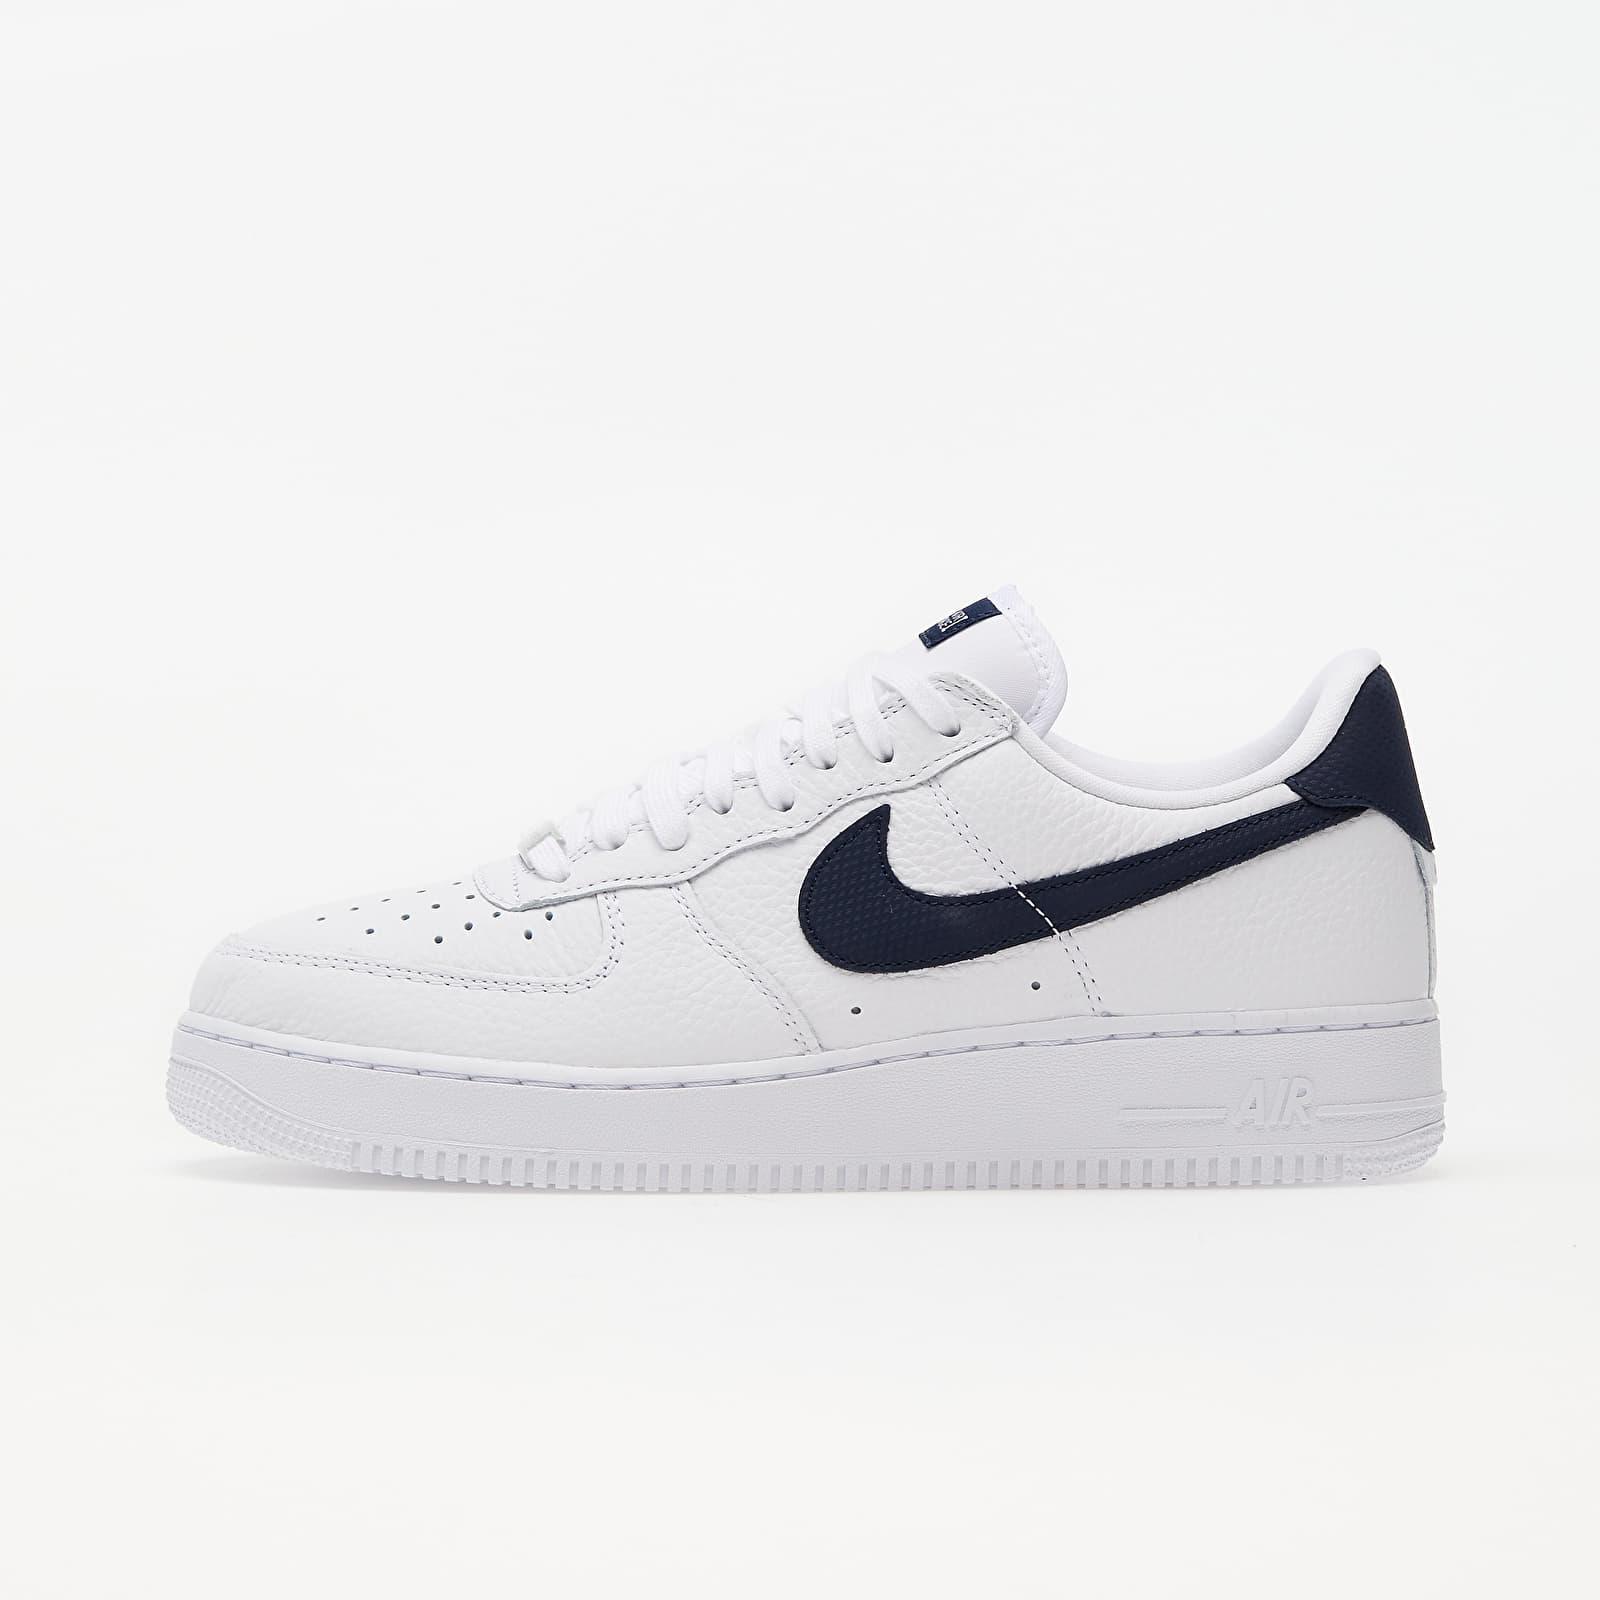 Pánské tenisky a boty Nike Air Force 1 '07 Craft White/ Obsidian-White